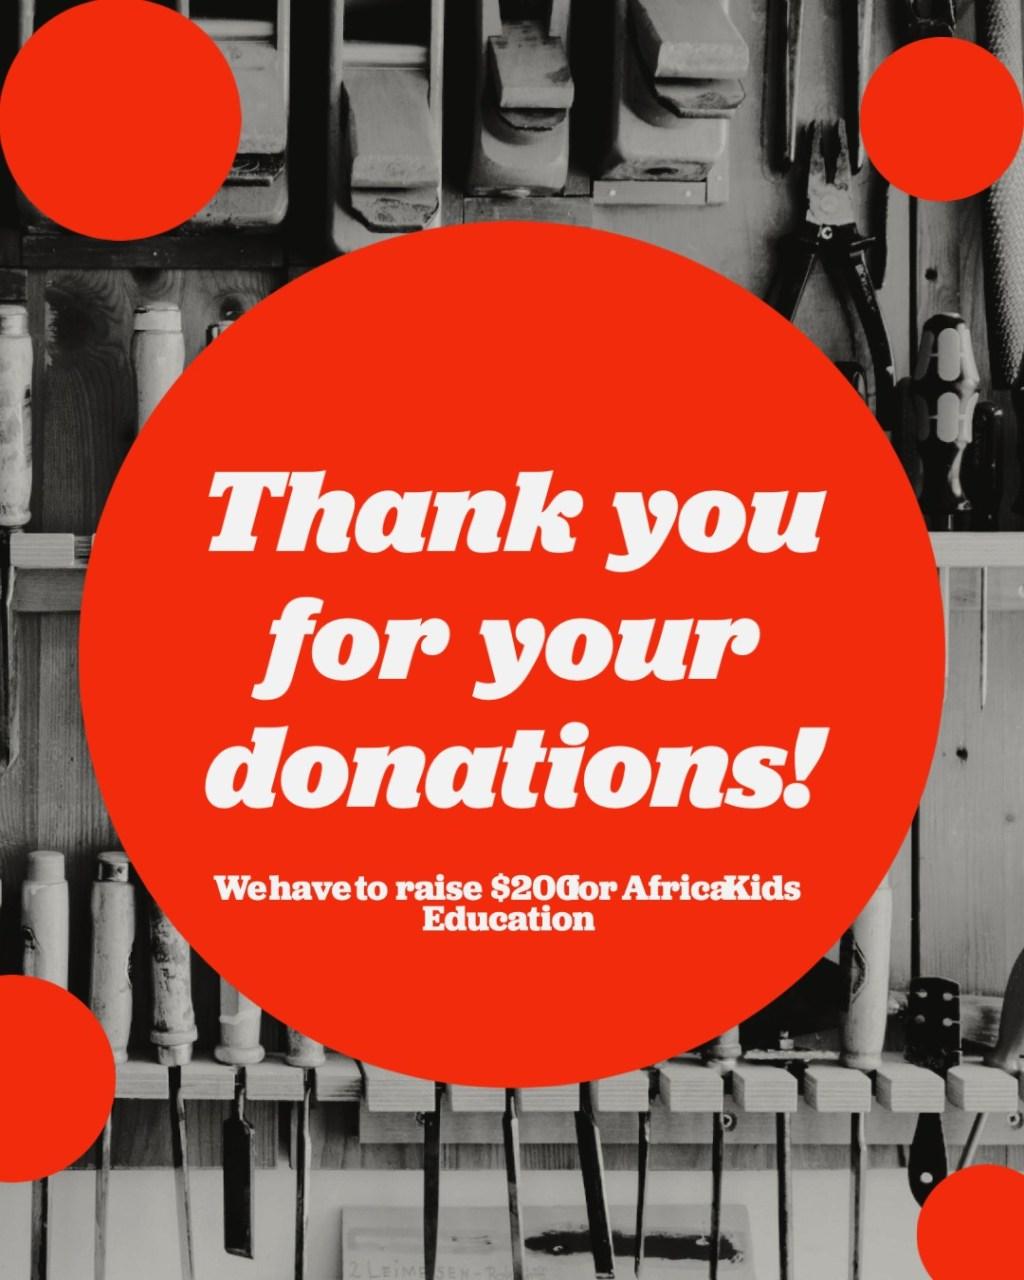 Fabhooks Donation Drive for Kids Education